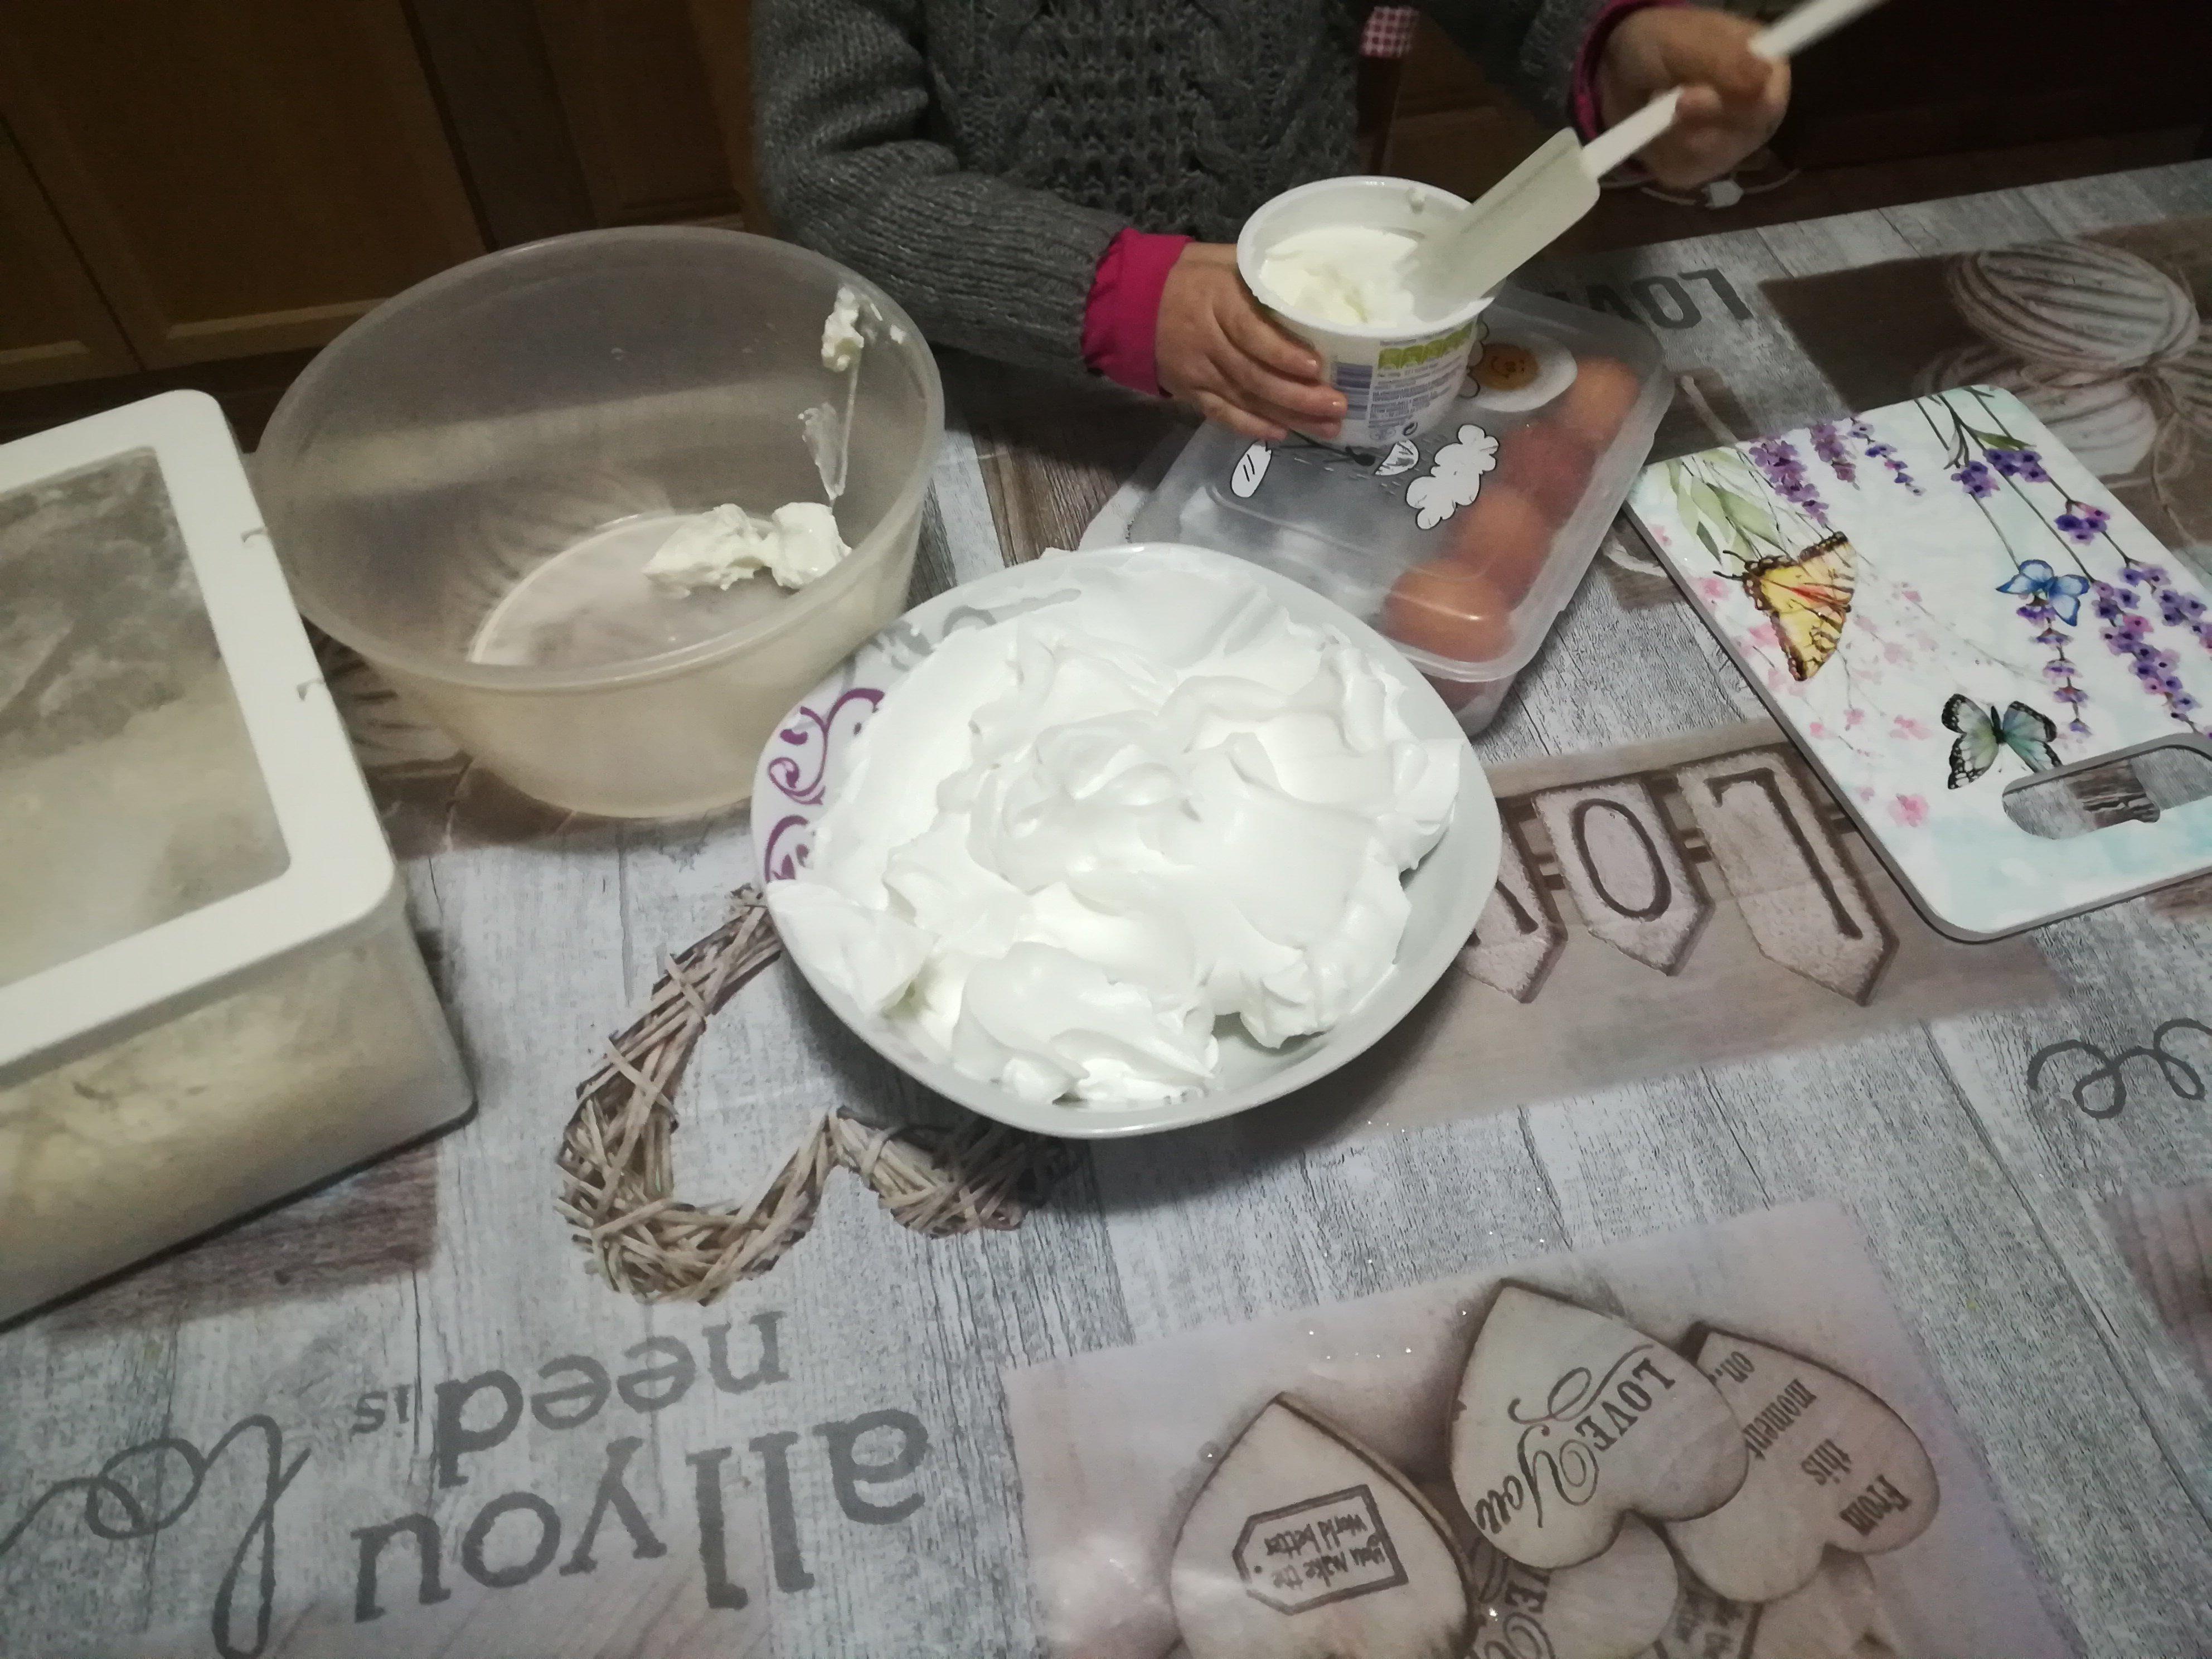 Torta panna e yogurt senza lattosio for Yogurt greco land